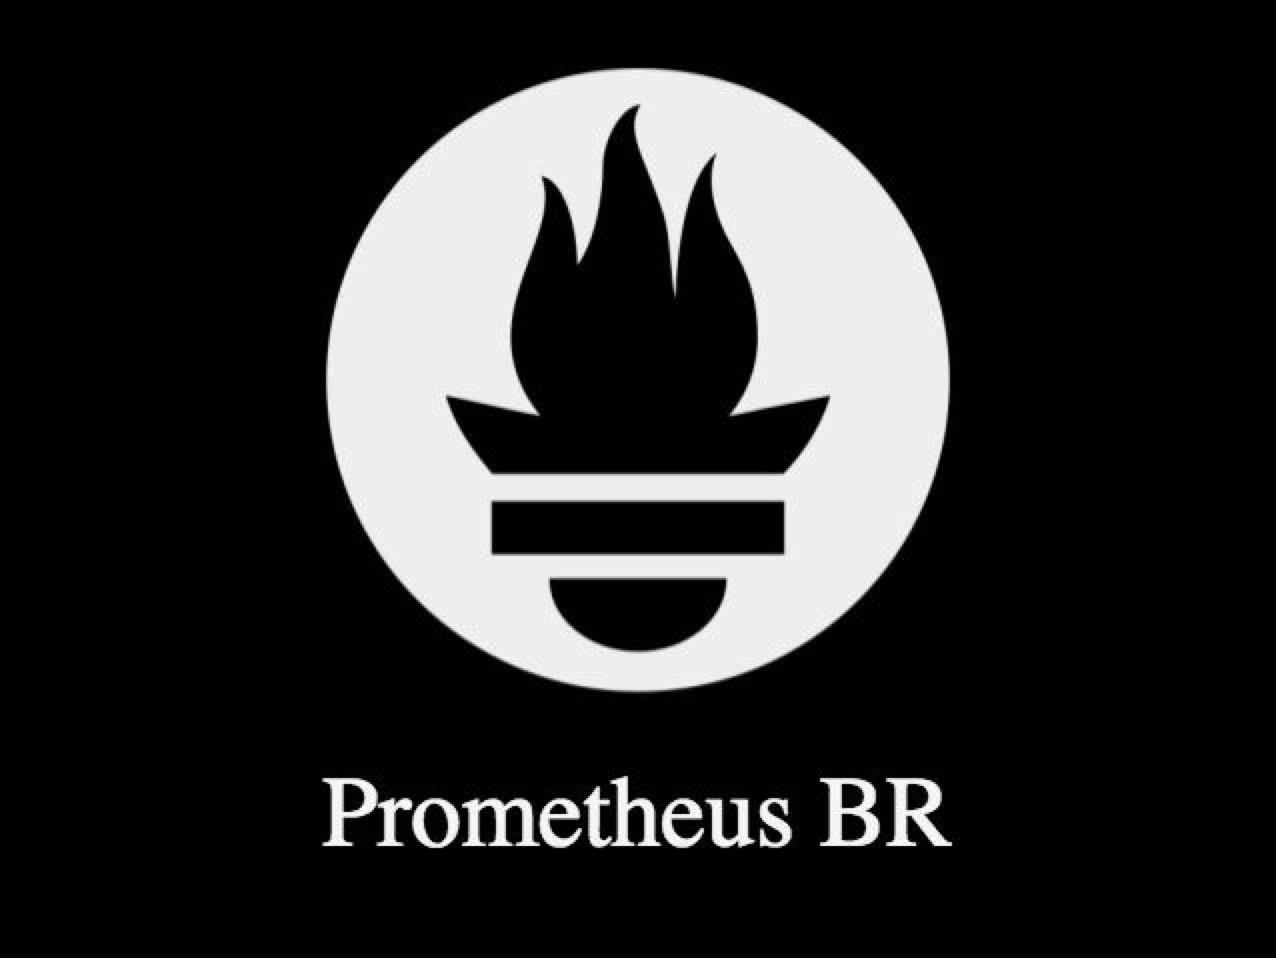 Prometheus-BR